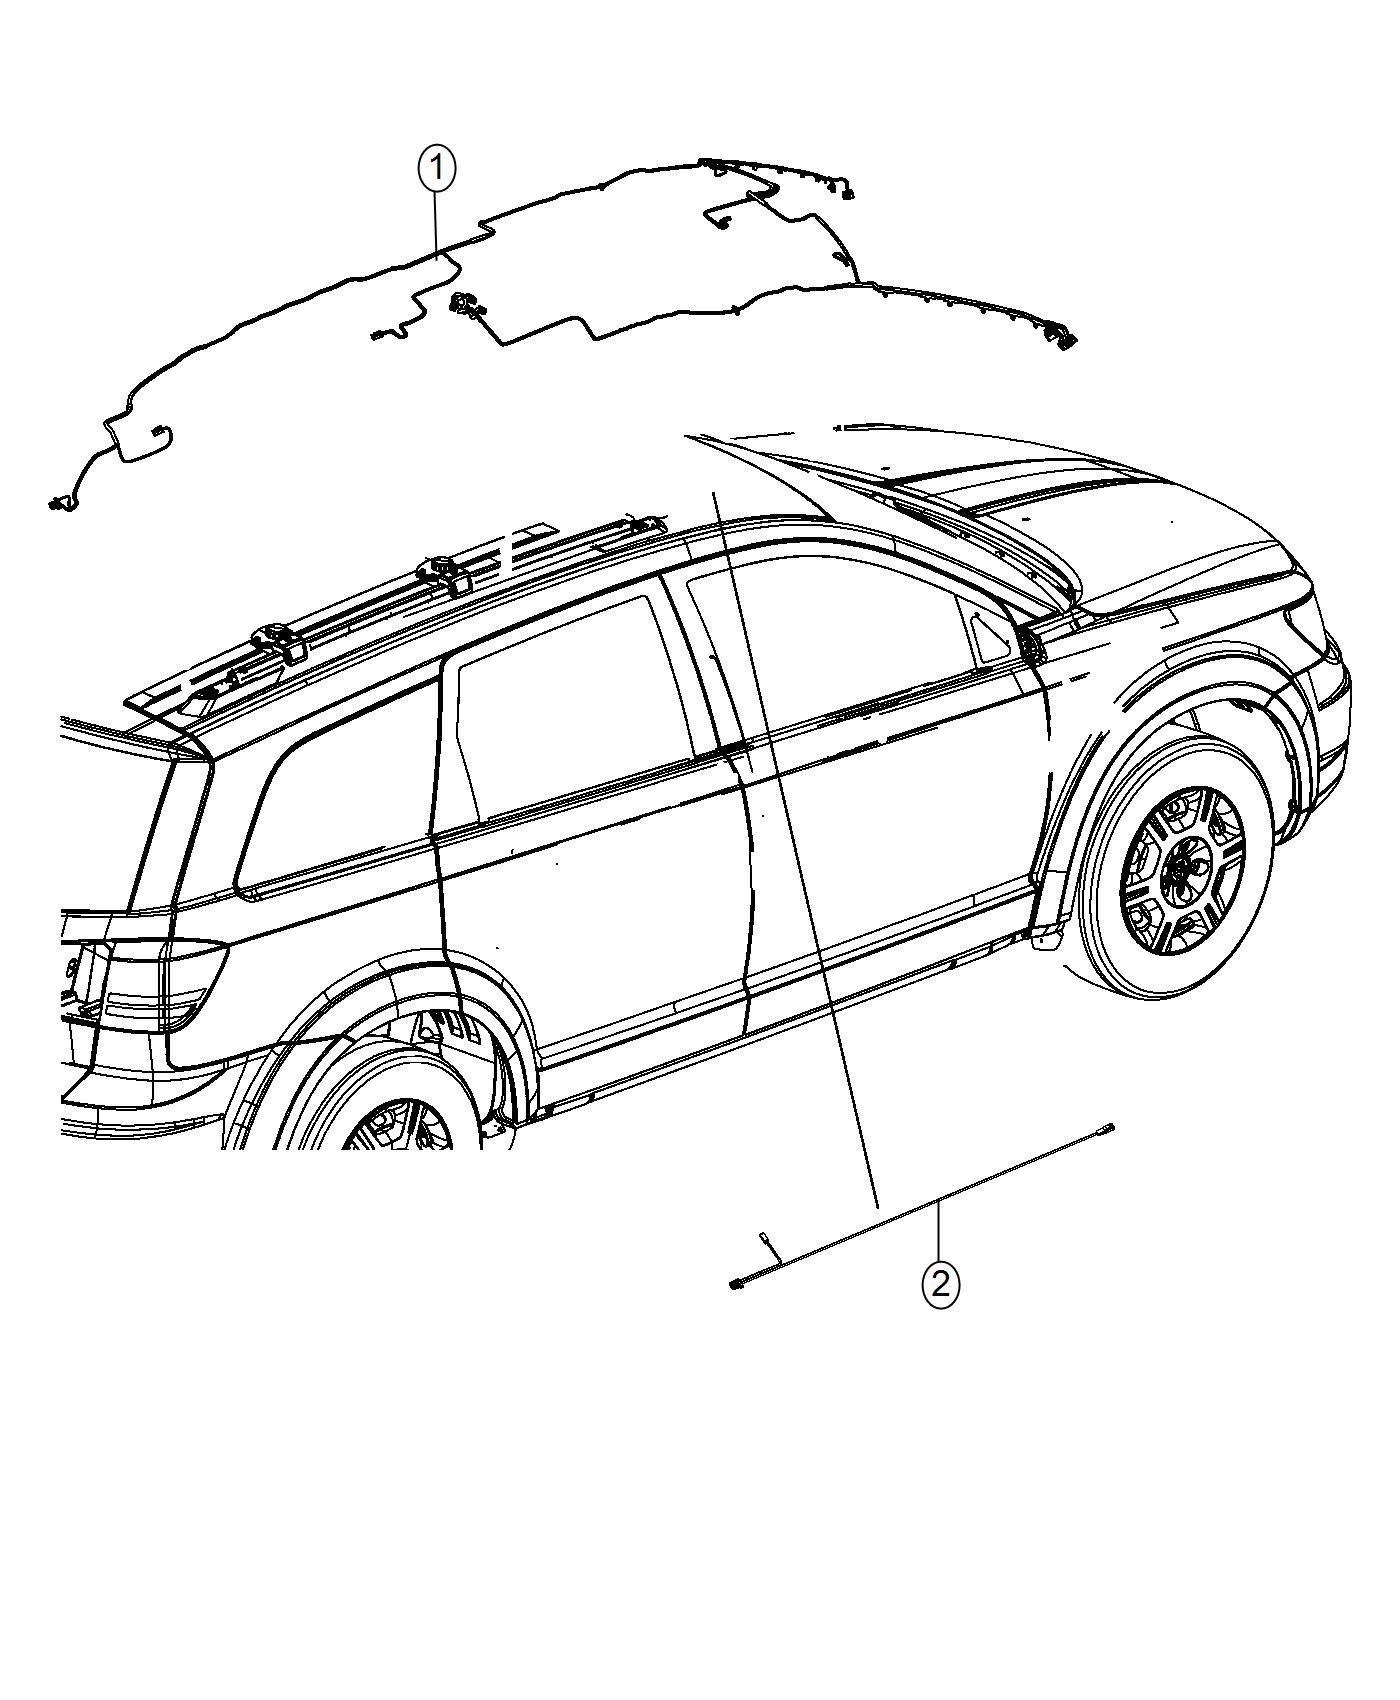 2017 Dodge Journey Wiring  Header  Us  Canada   Rr View